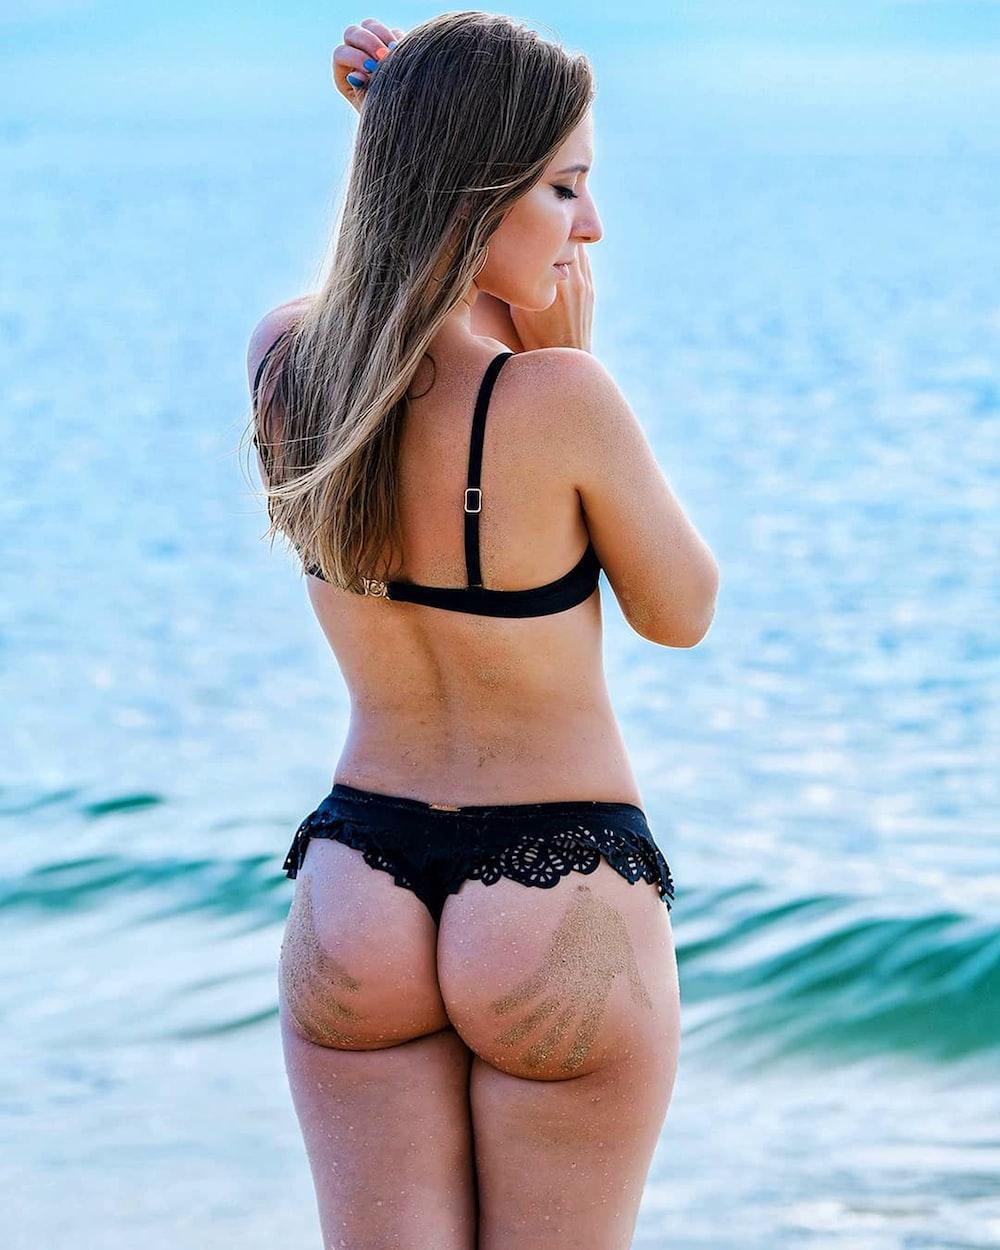 woman in black bikini standing on sea shore during daytime